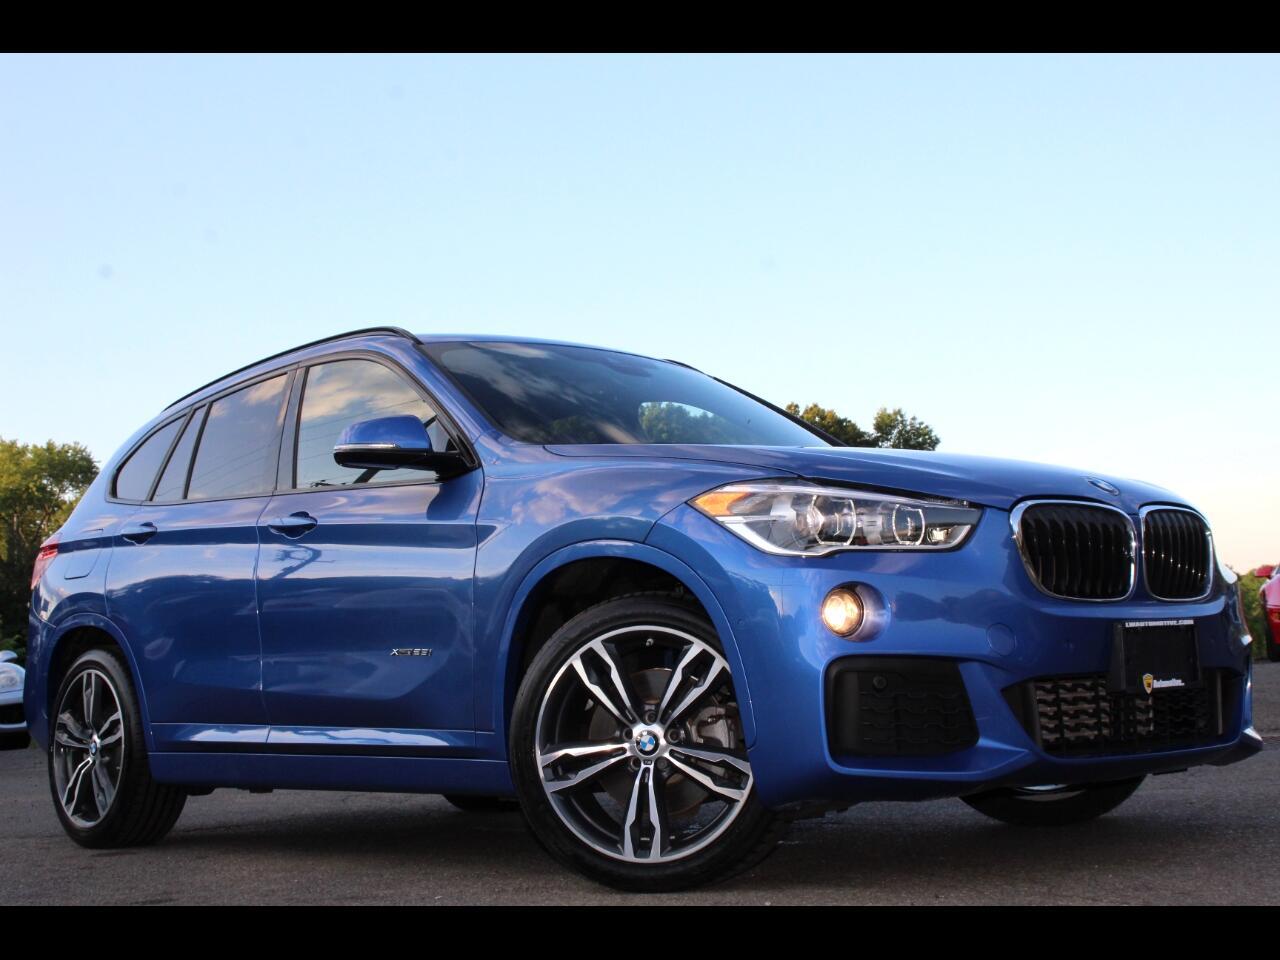 BMW X1 xDrive28i Sports Activity Vehicle 2017